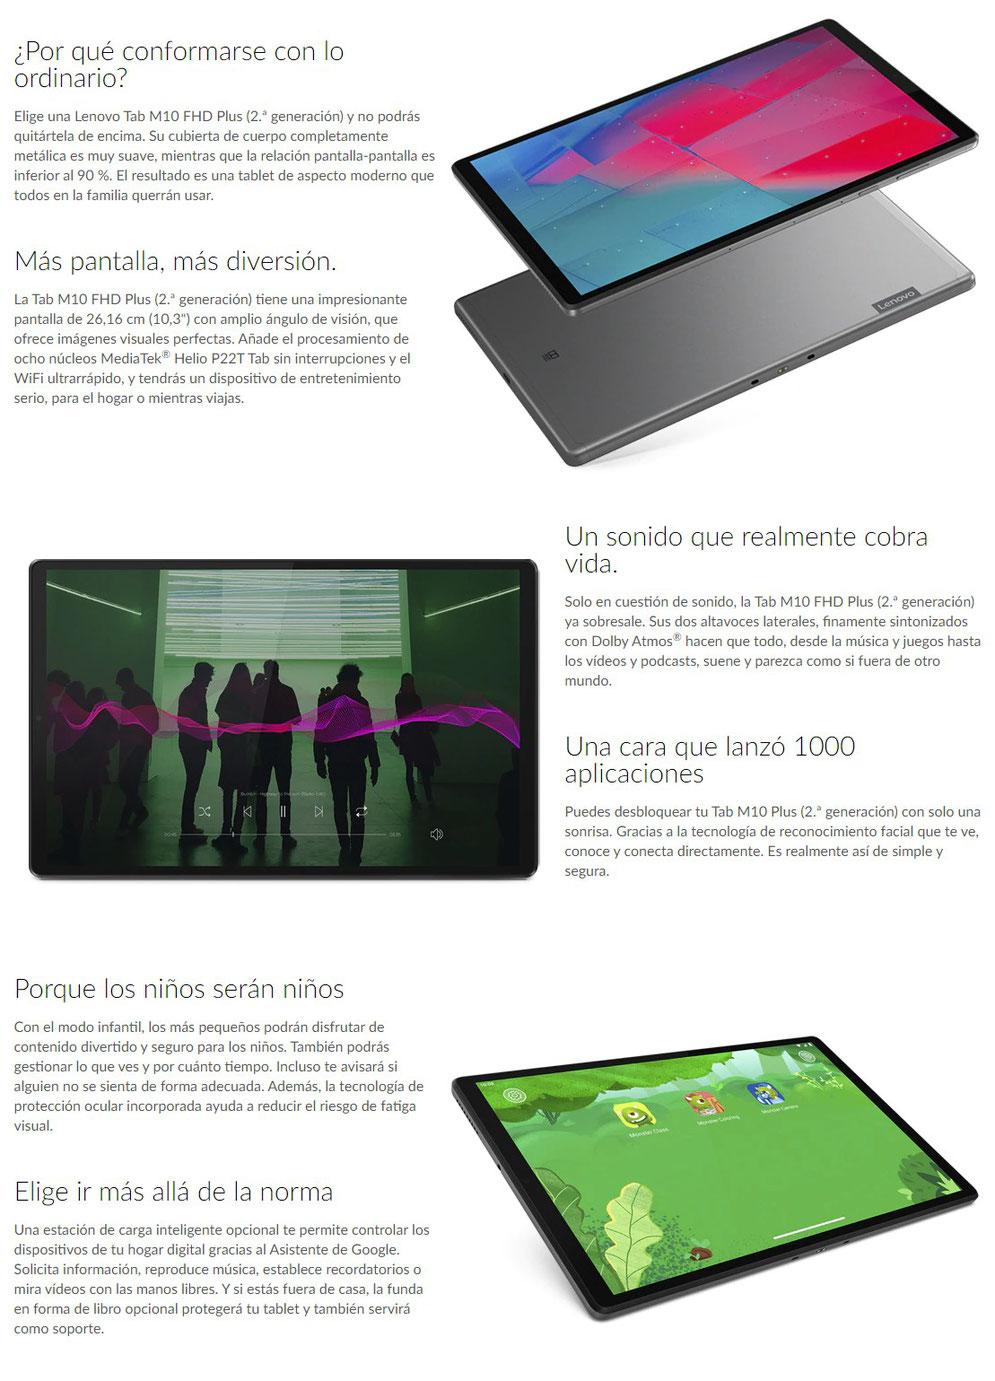 "Tablet Lenovo M10 FHD Plus 10,3"" 64GB en Tenerife"